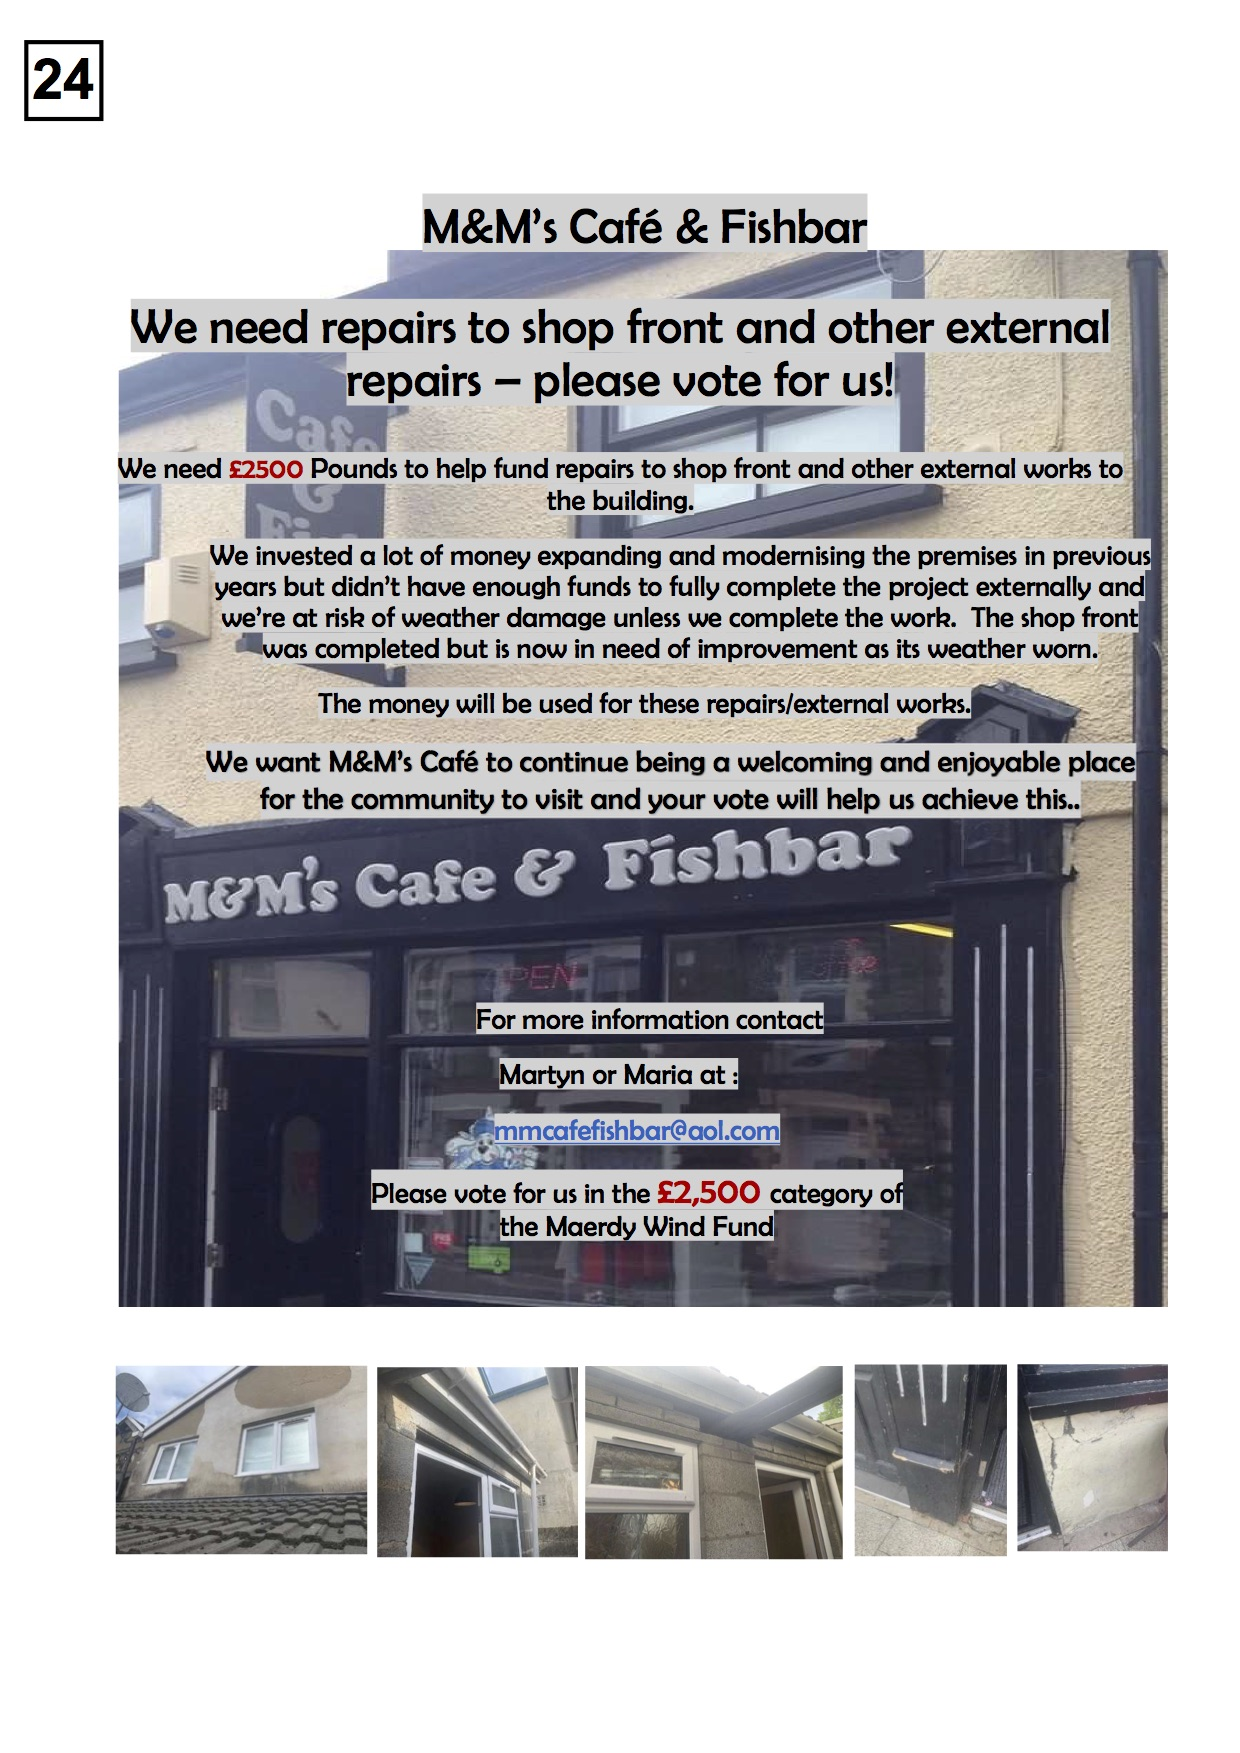 24. M&Ms Fishbar - Poster - 50719